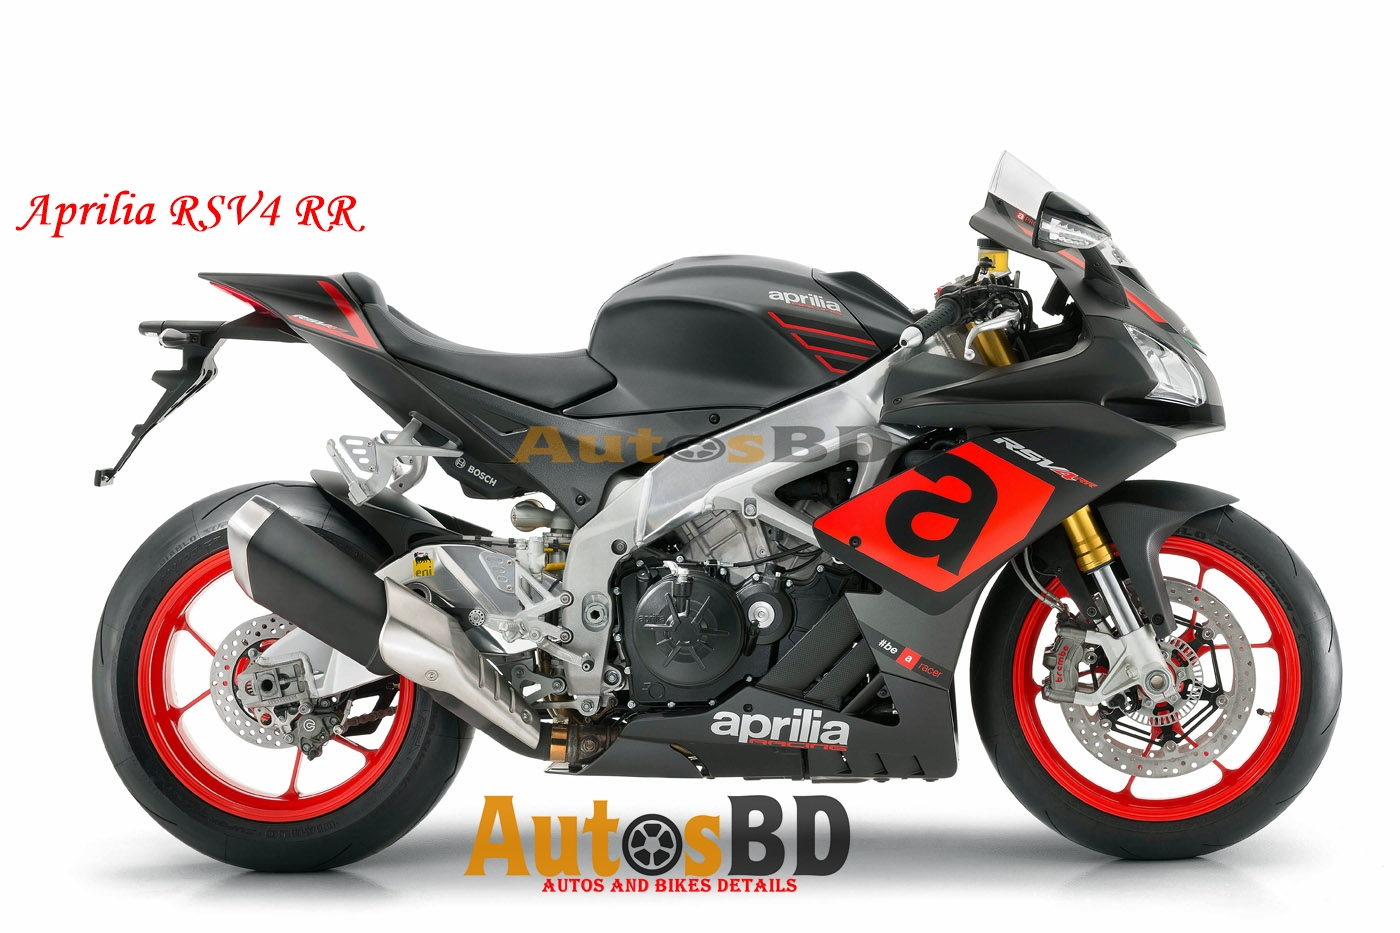 Aprilia RSV4 RR Motorcycle Price in India